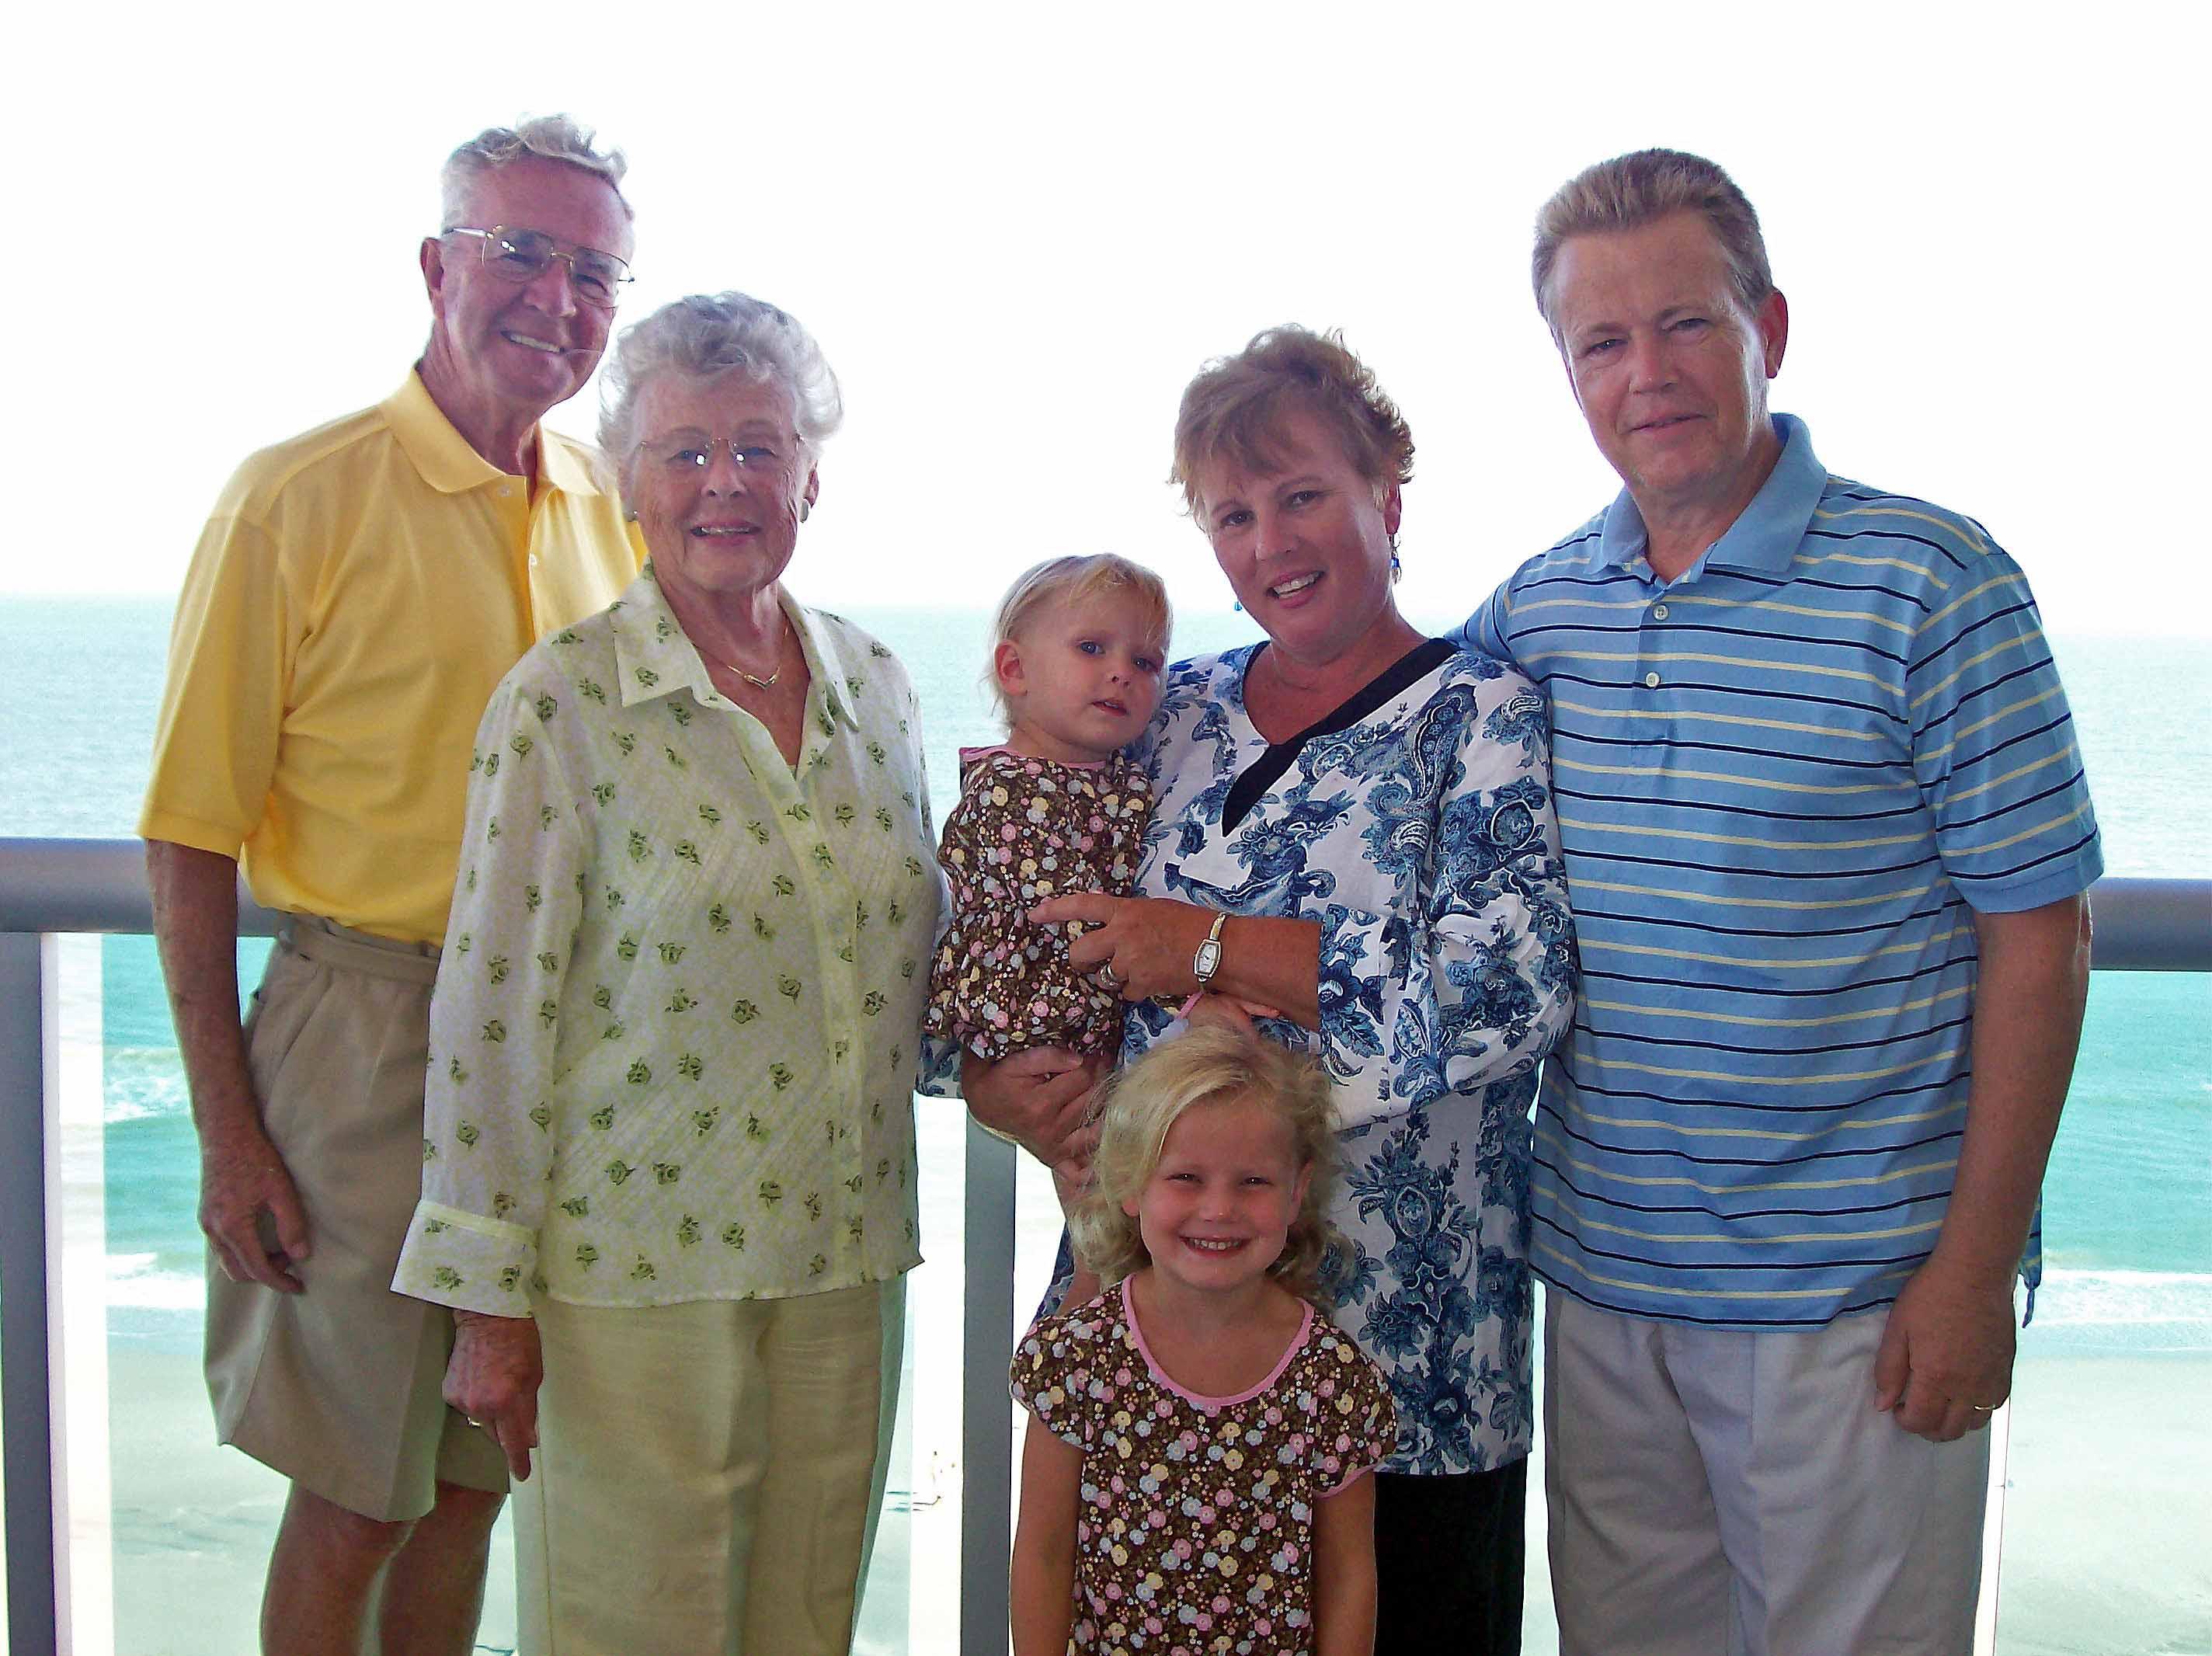 My Nana and Papa and My Mom and Dad